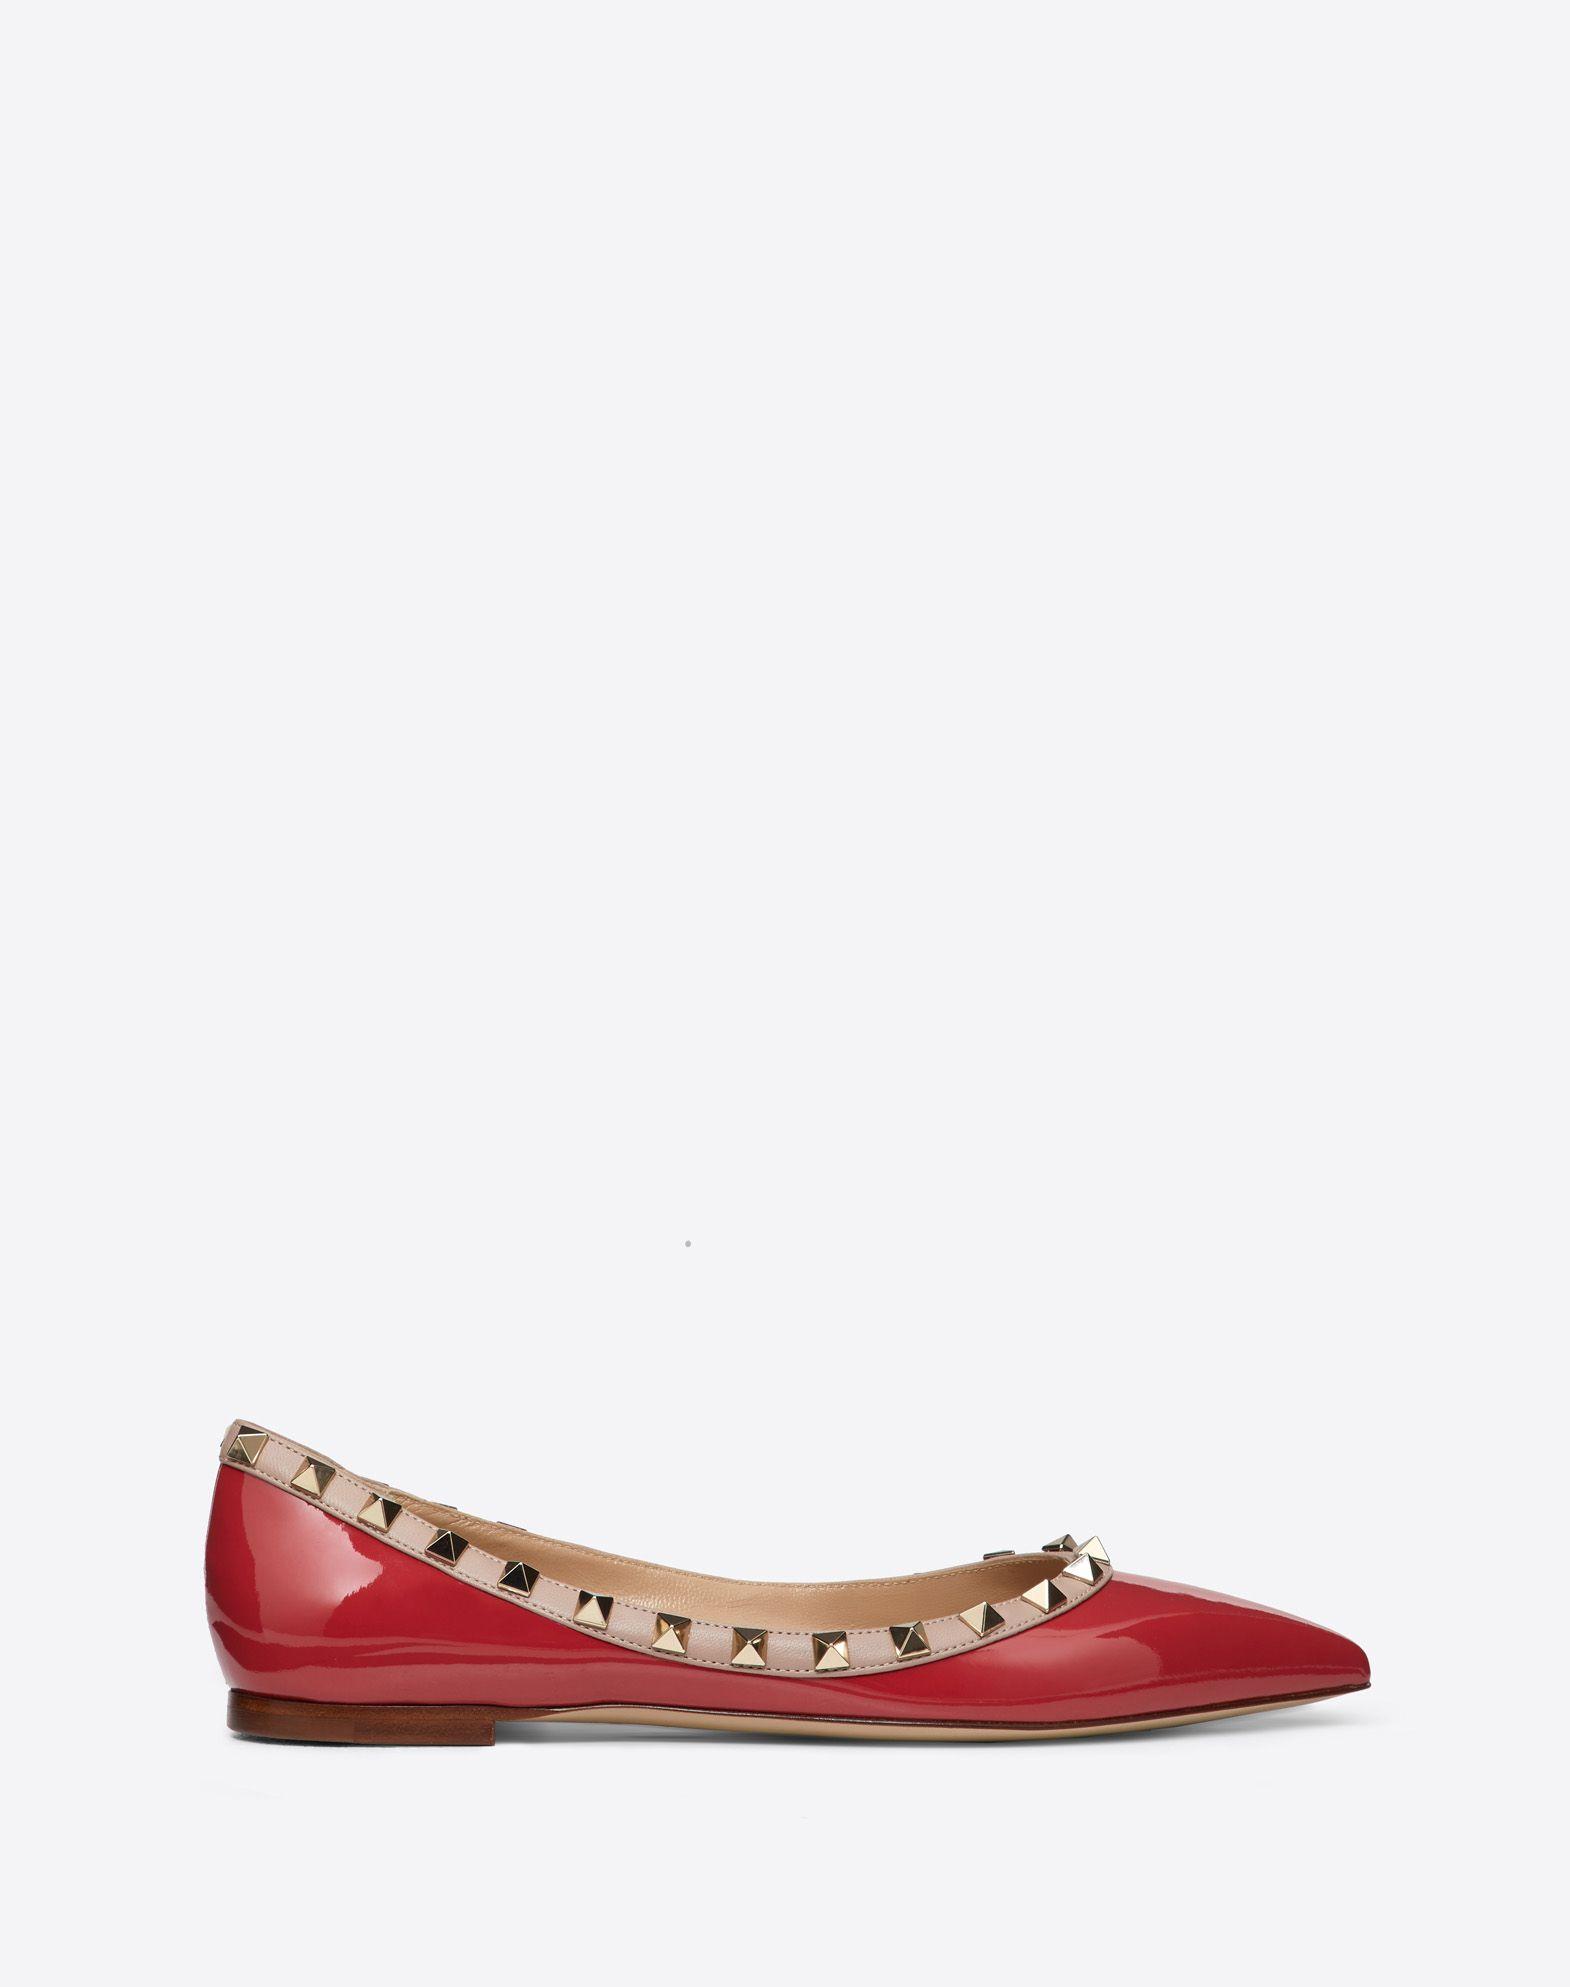 Rockstud Patent Leather Ballet Flat